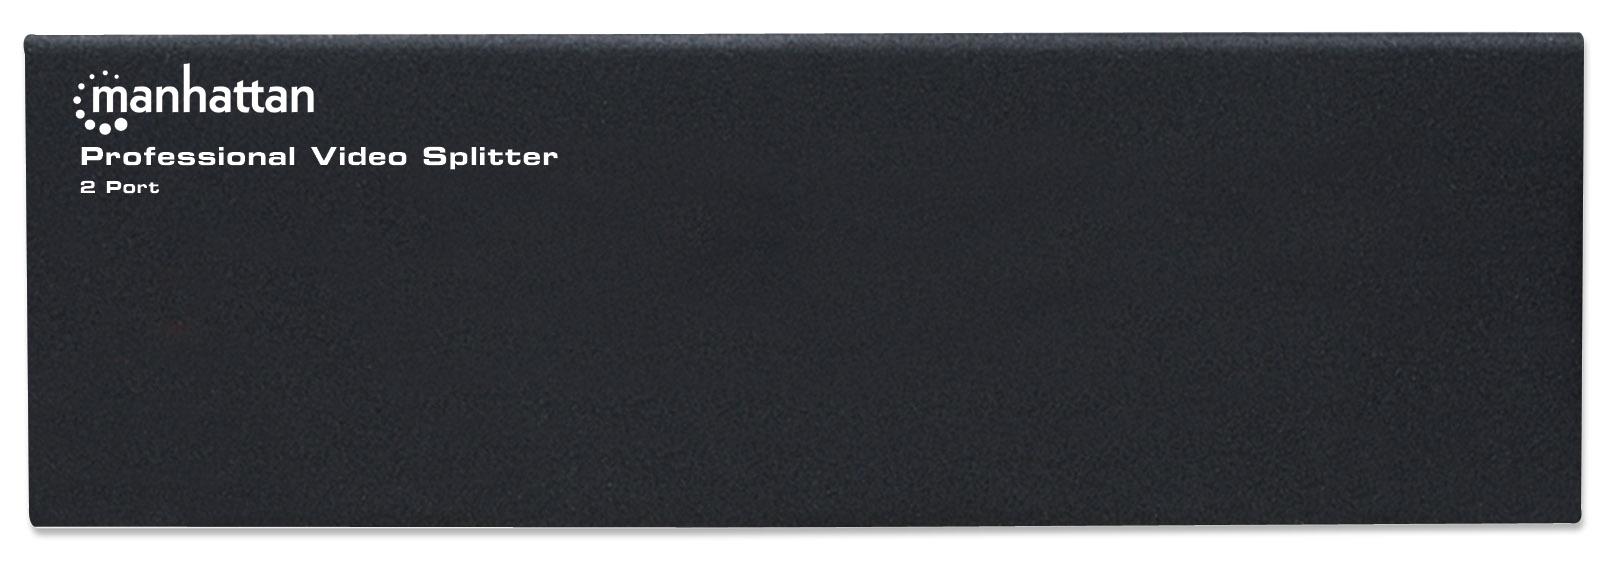 Professional Video Splitter